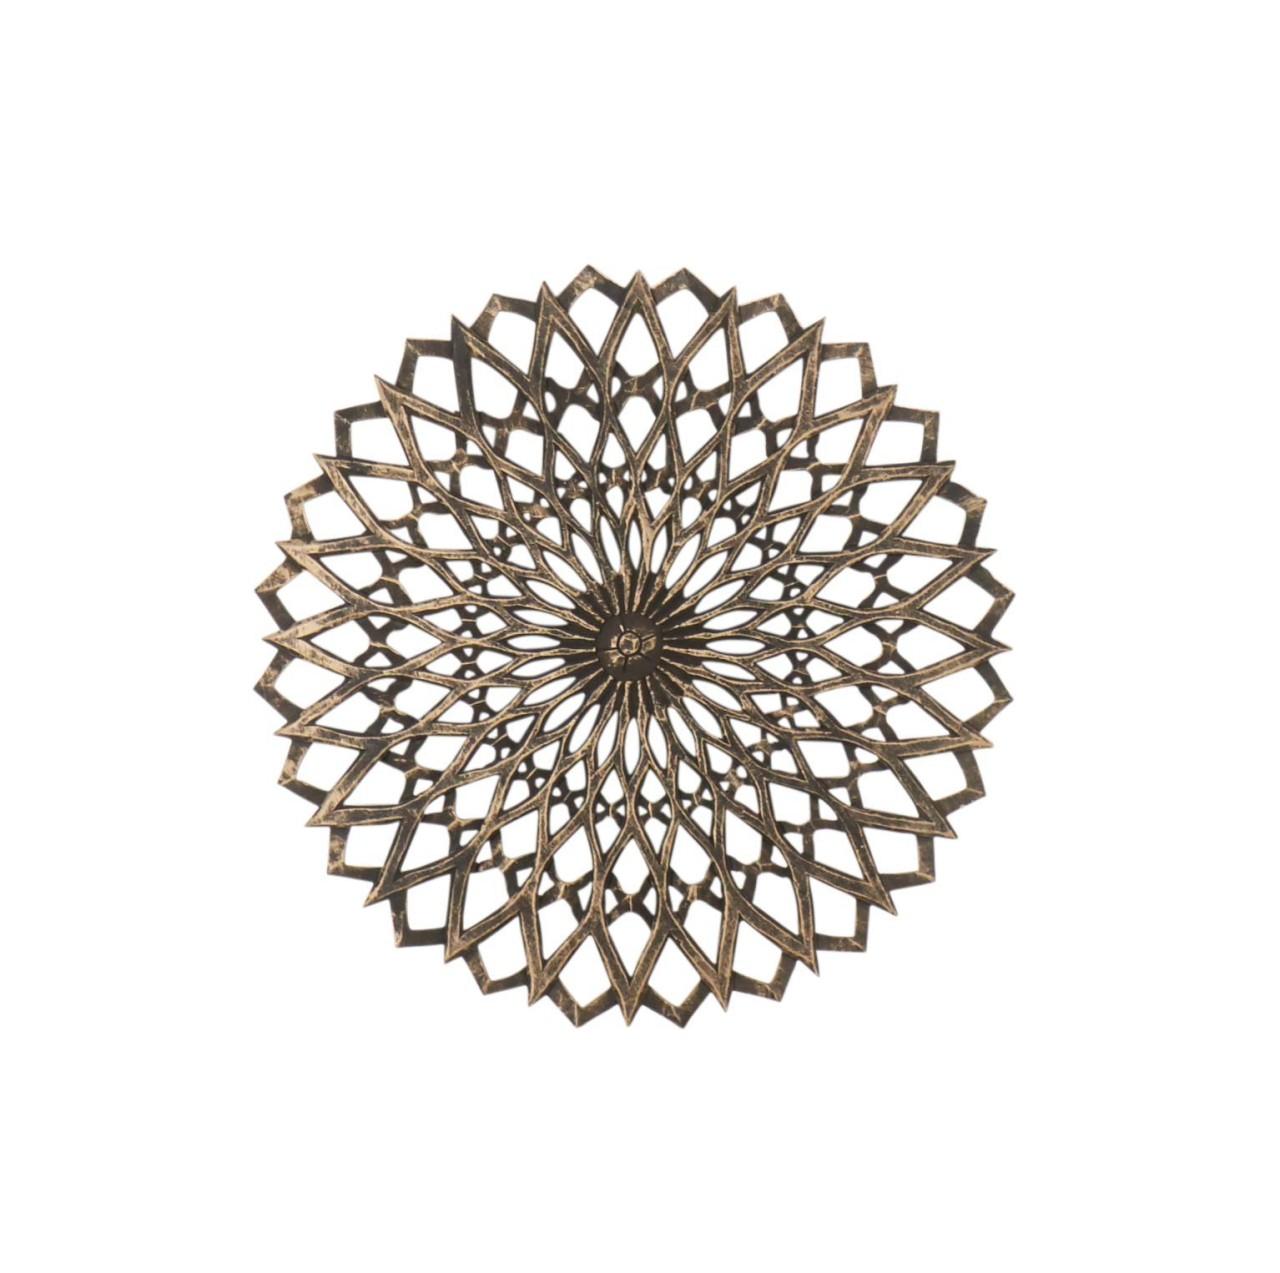 Mandala Holzbild MDF 60cm schwarz-goldfarben